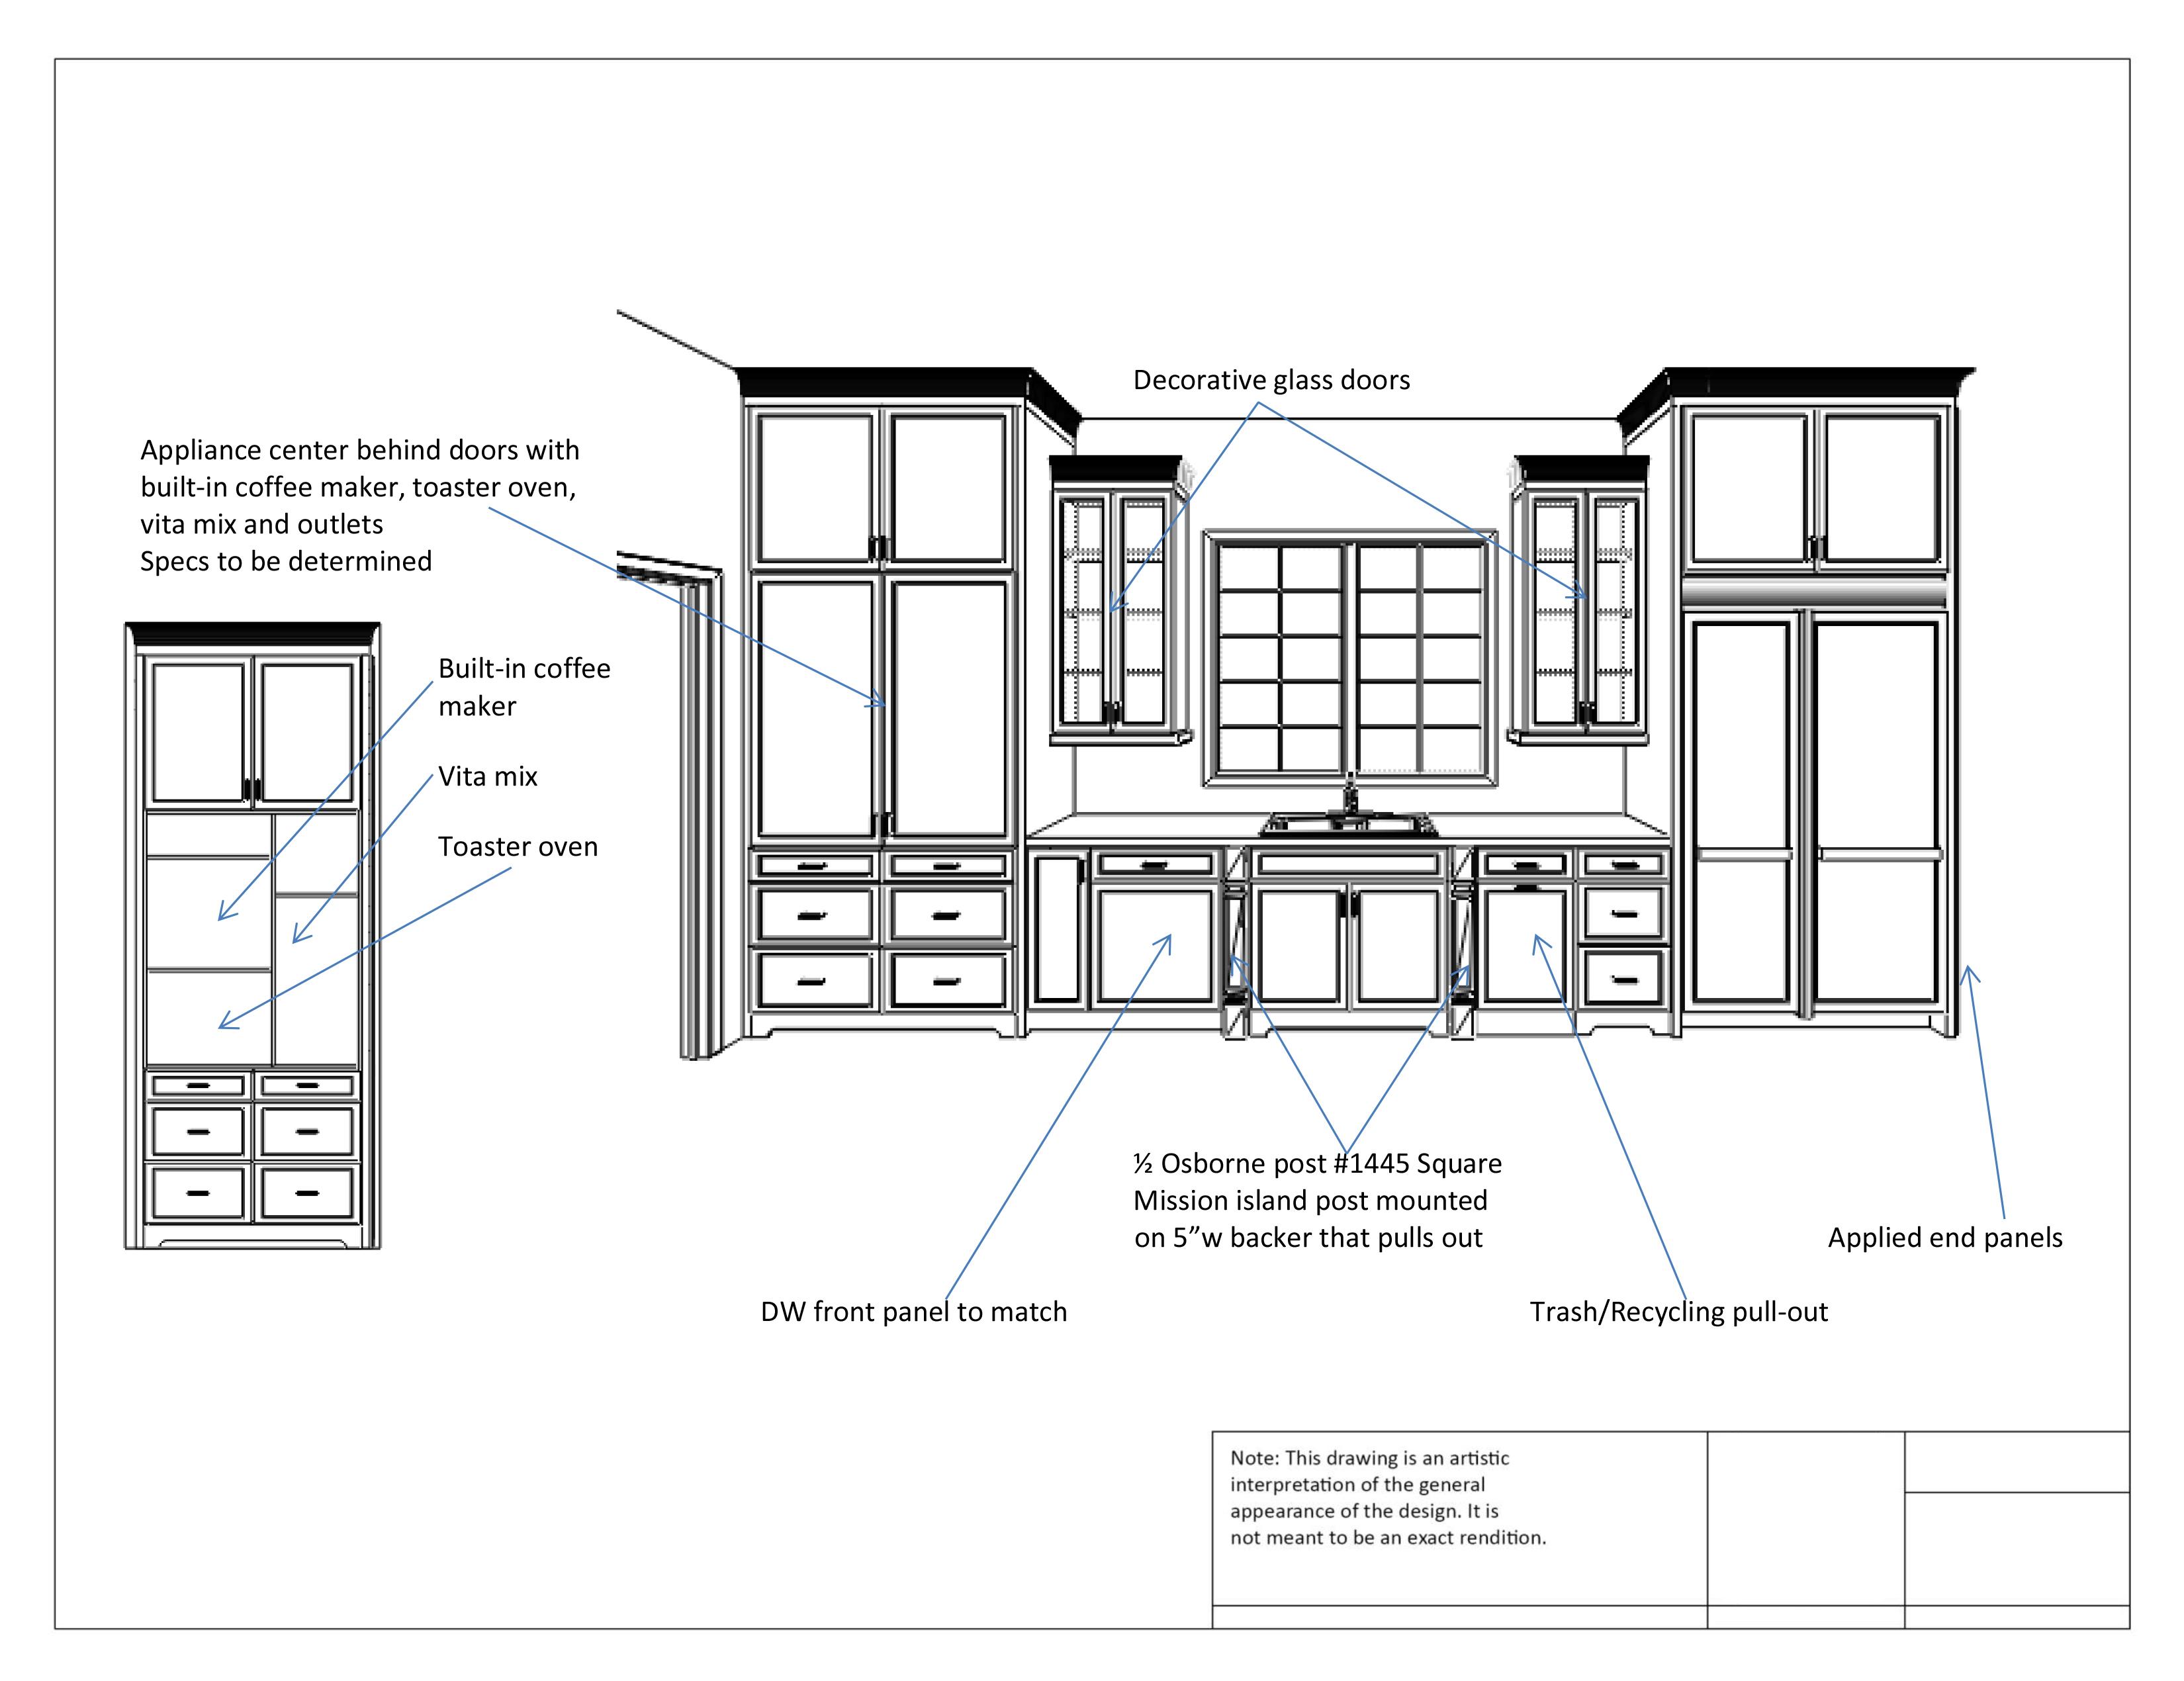 20 20 Design Services Joy To Design Interiors